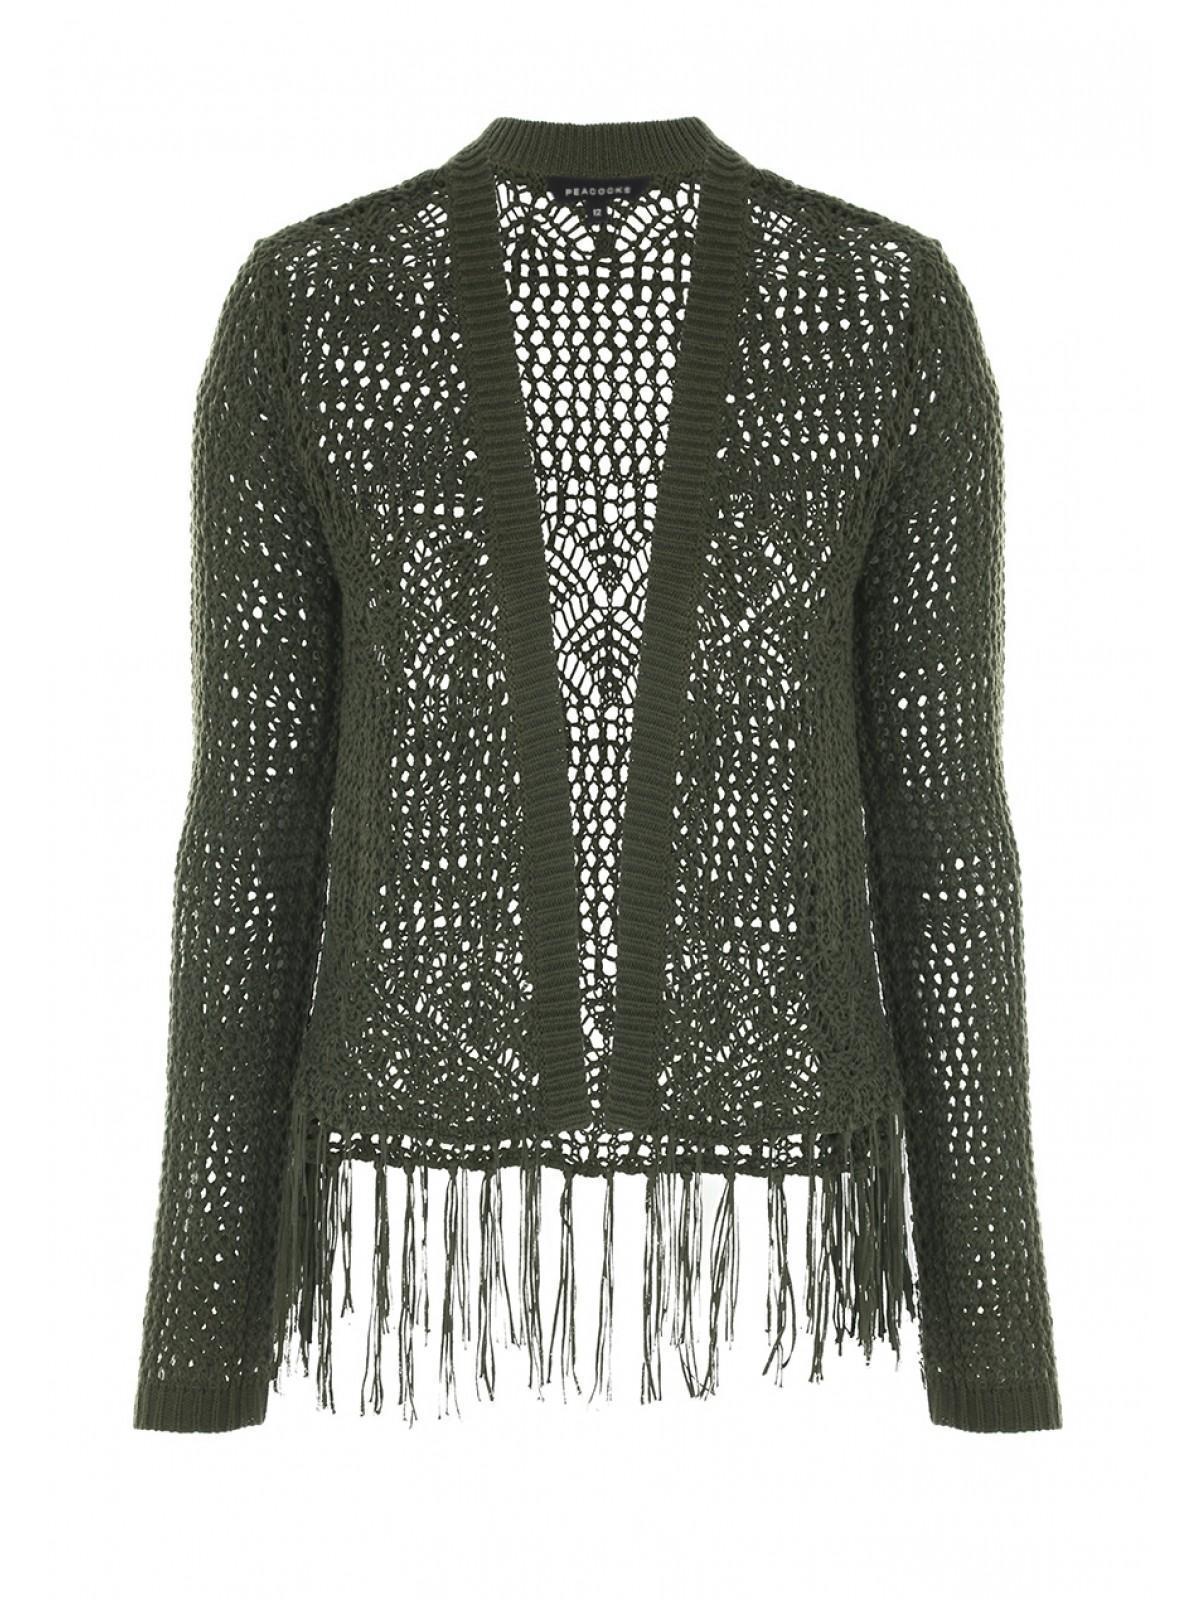 88a8a18a991 Home; Womens Khaki Cropped Crochet Cardigan. Back. PreviousNext